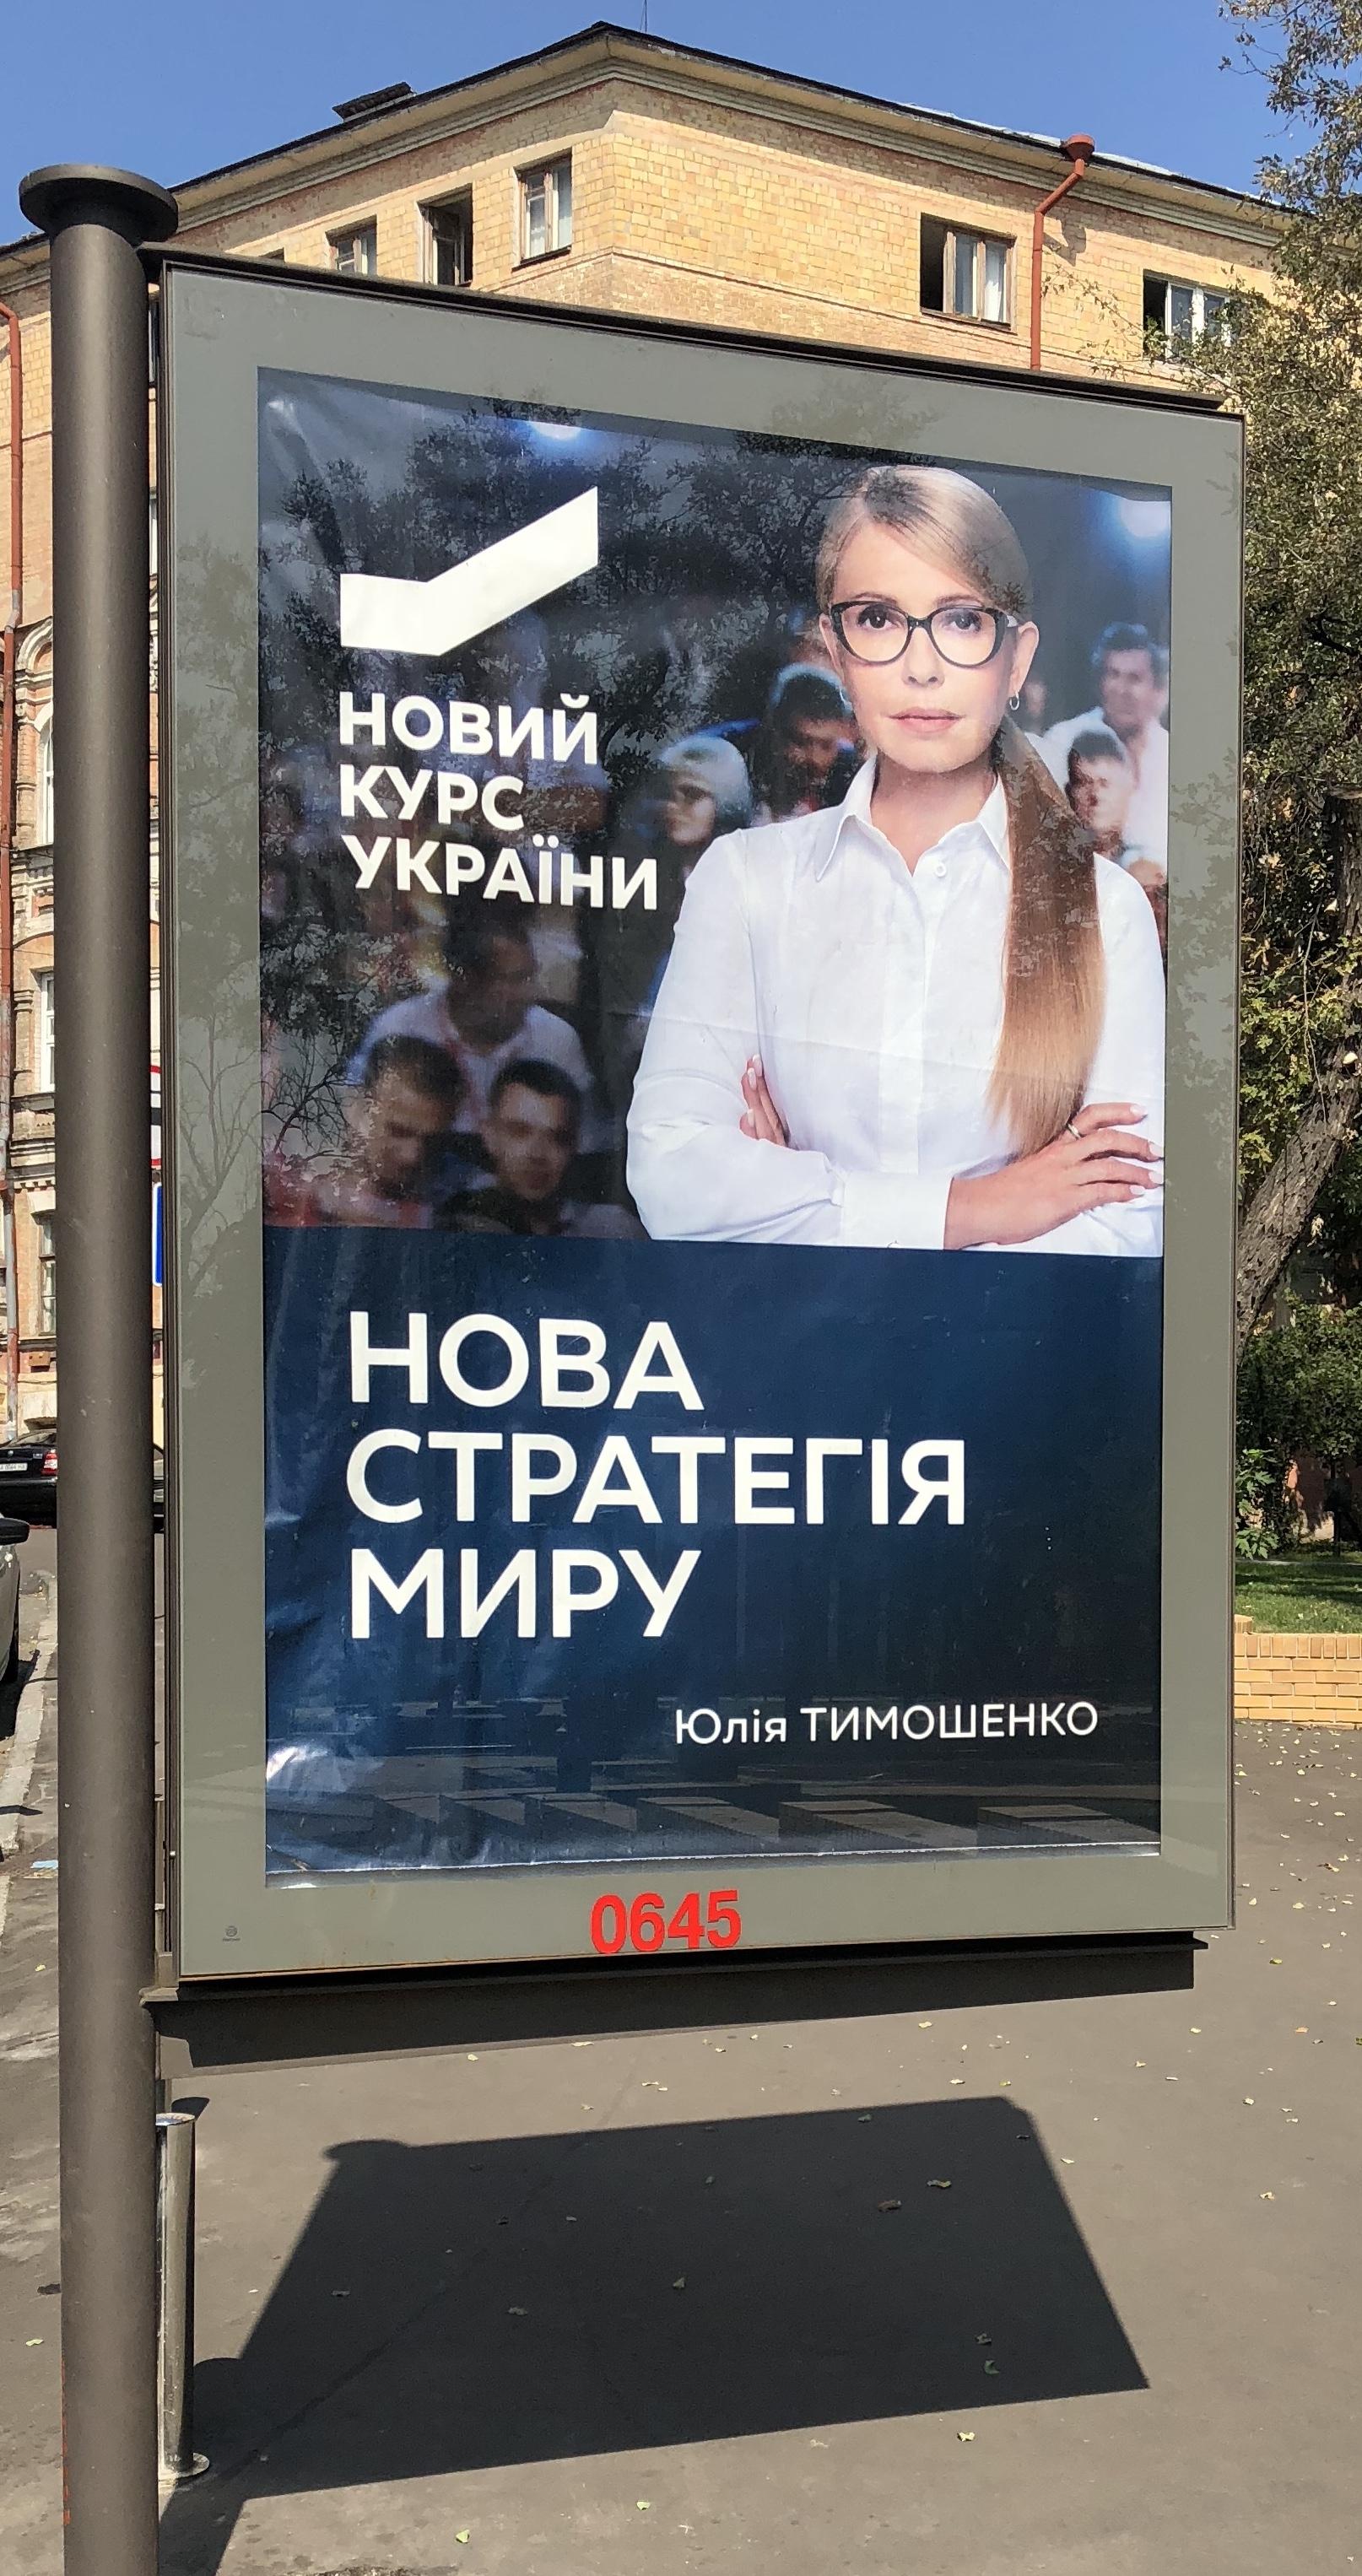 2018 billboard for Tymoshenko in Kiev. (Wikimedia Commons)